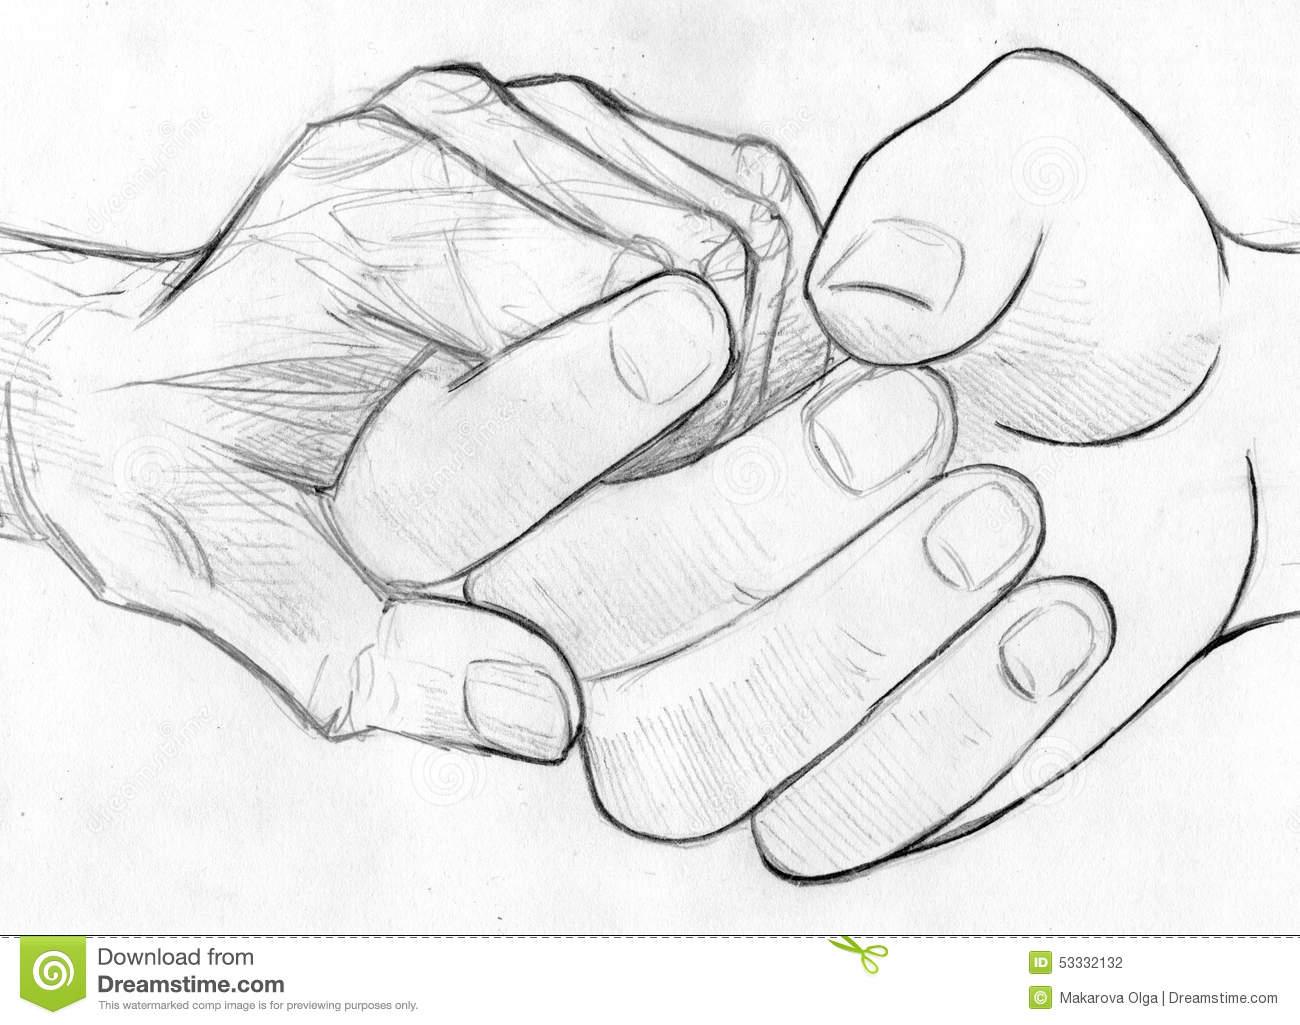 1300x1025 Boy Holding Girl Hand Pencil Art Pencil Sketch Of Boy And Girl